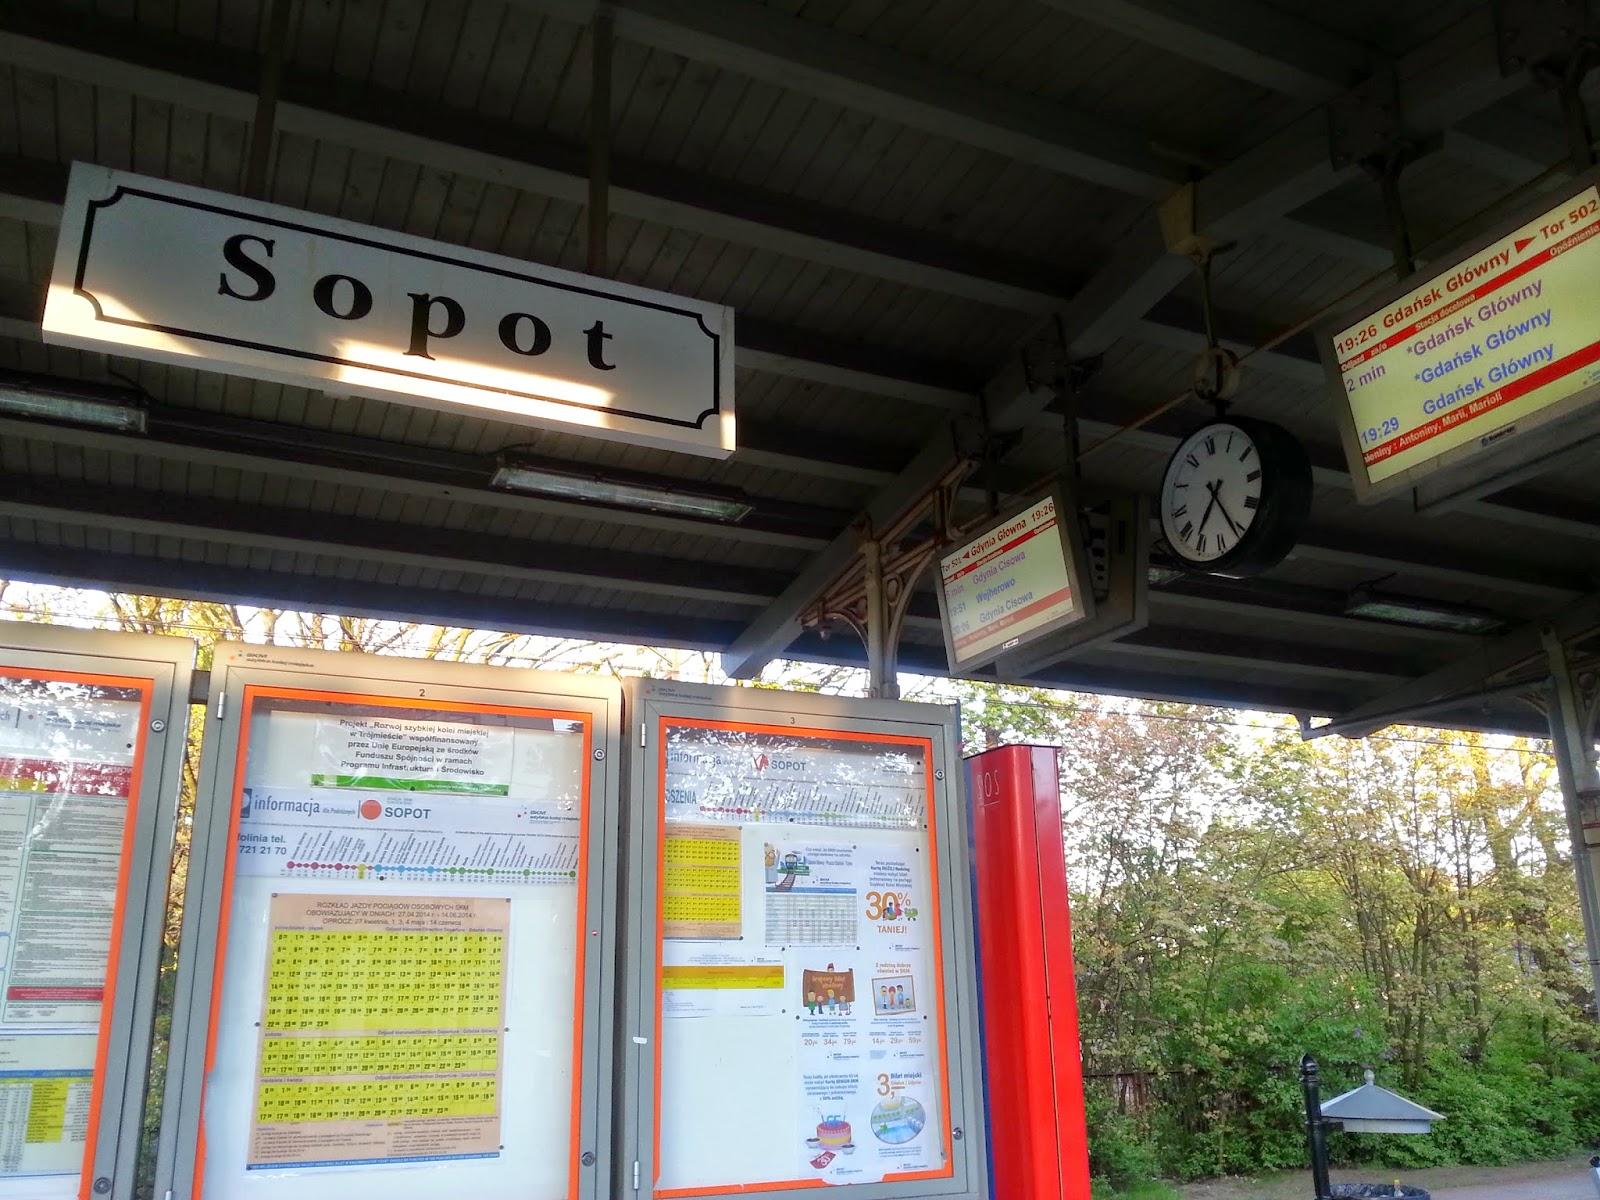 Sopot Dworzec